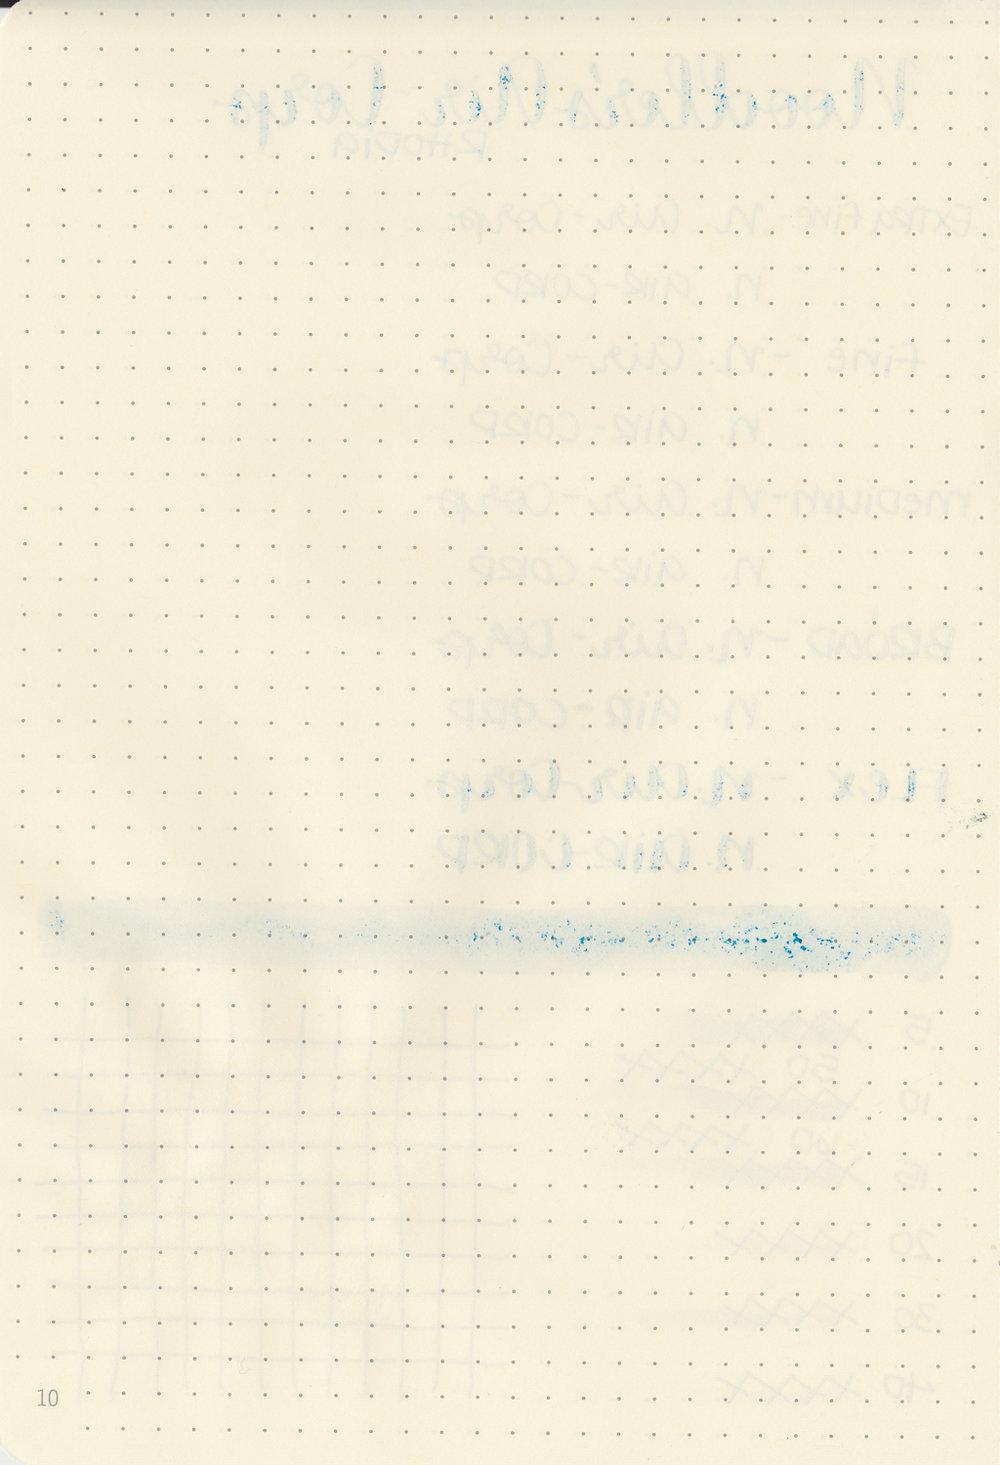 NoodAirCorp-4.jpg